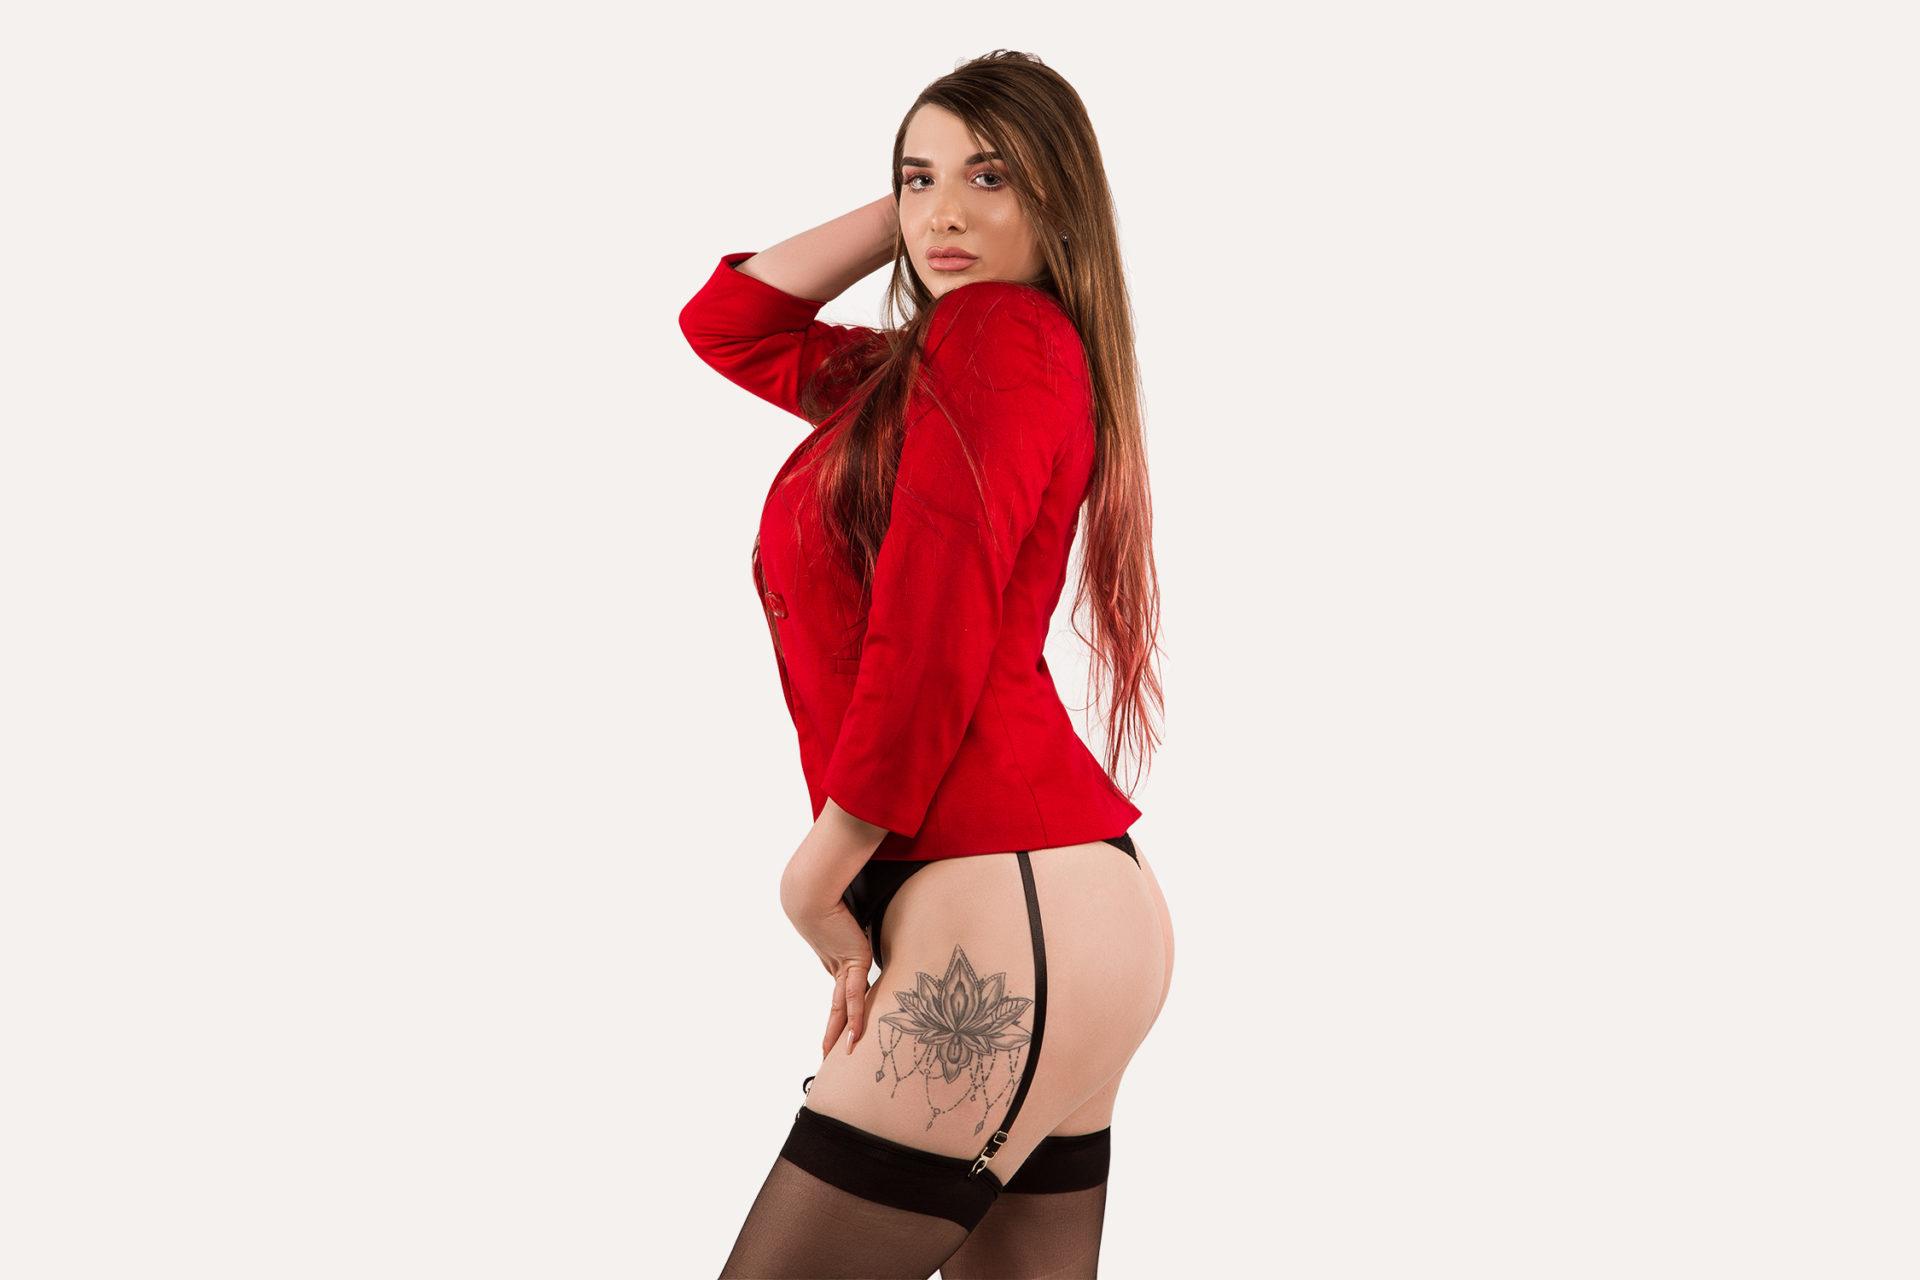 Nicole #1